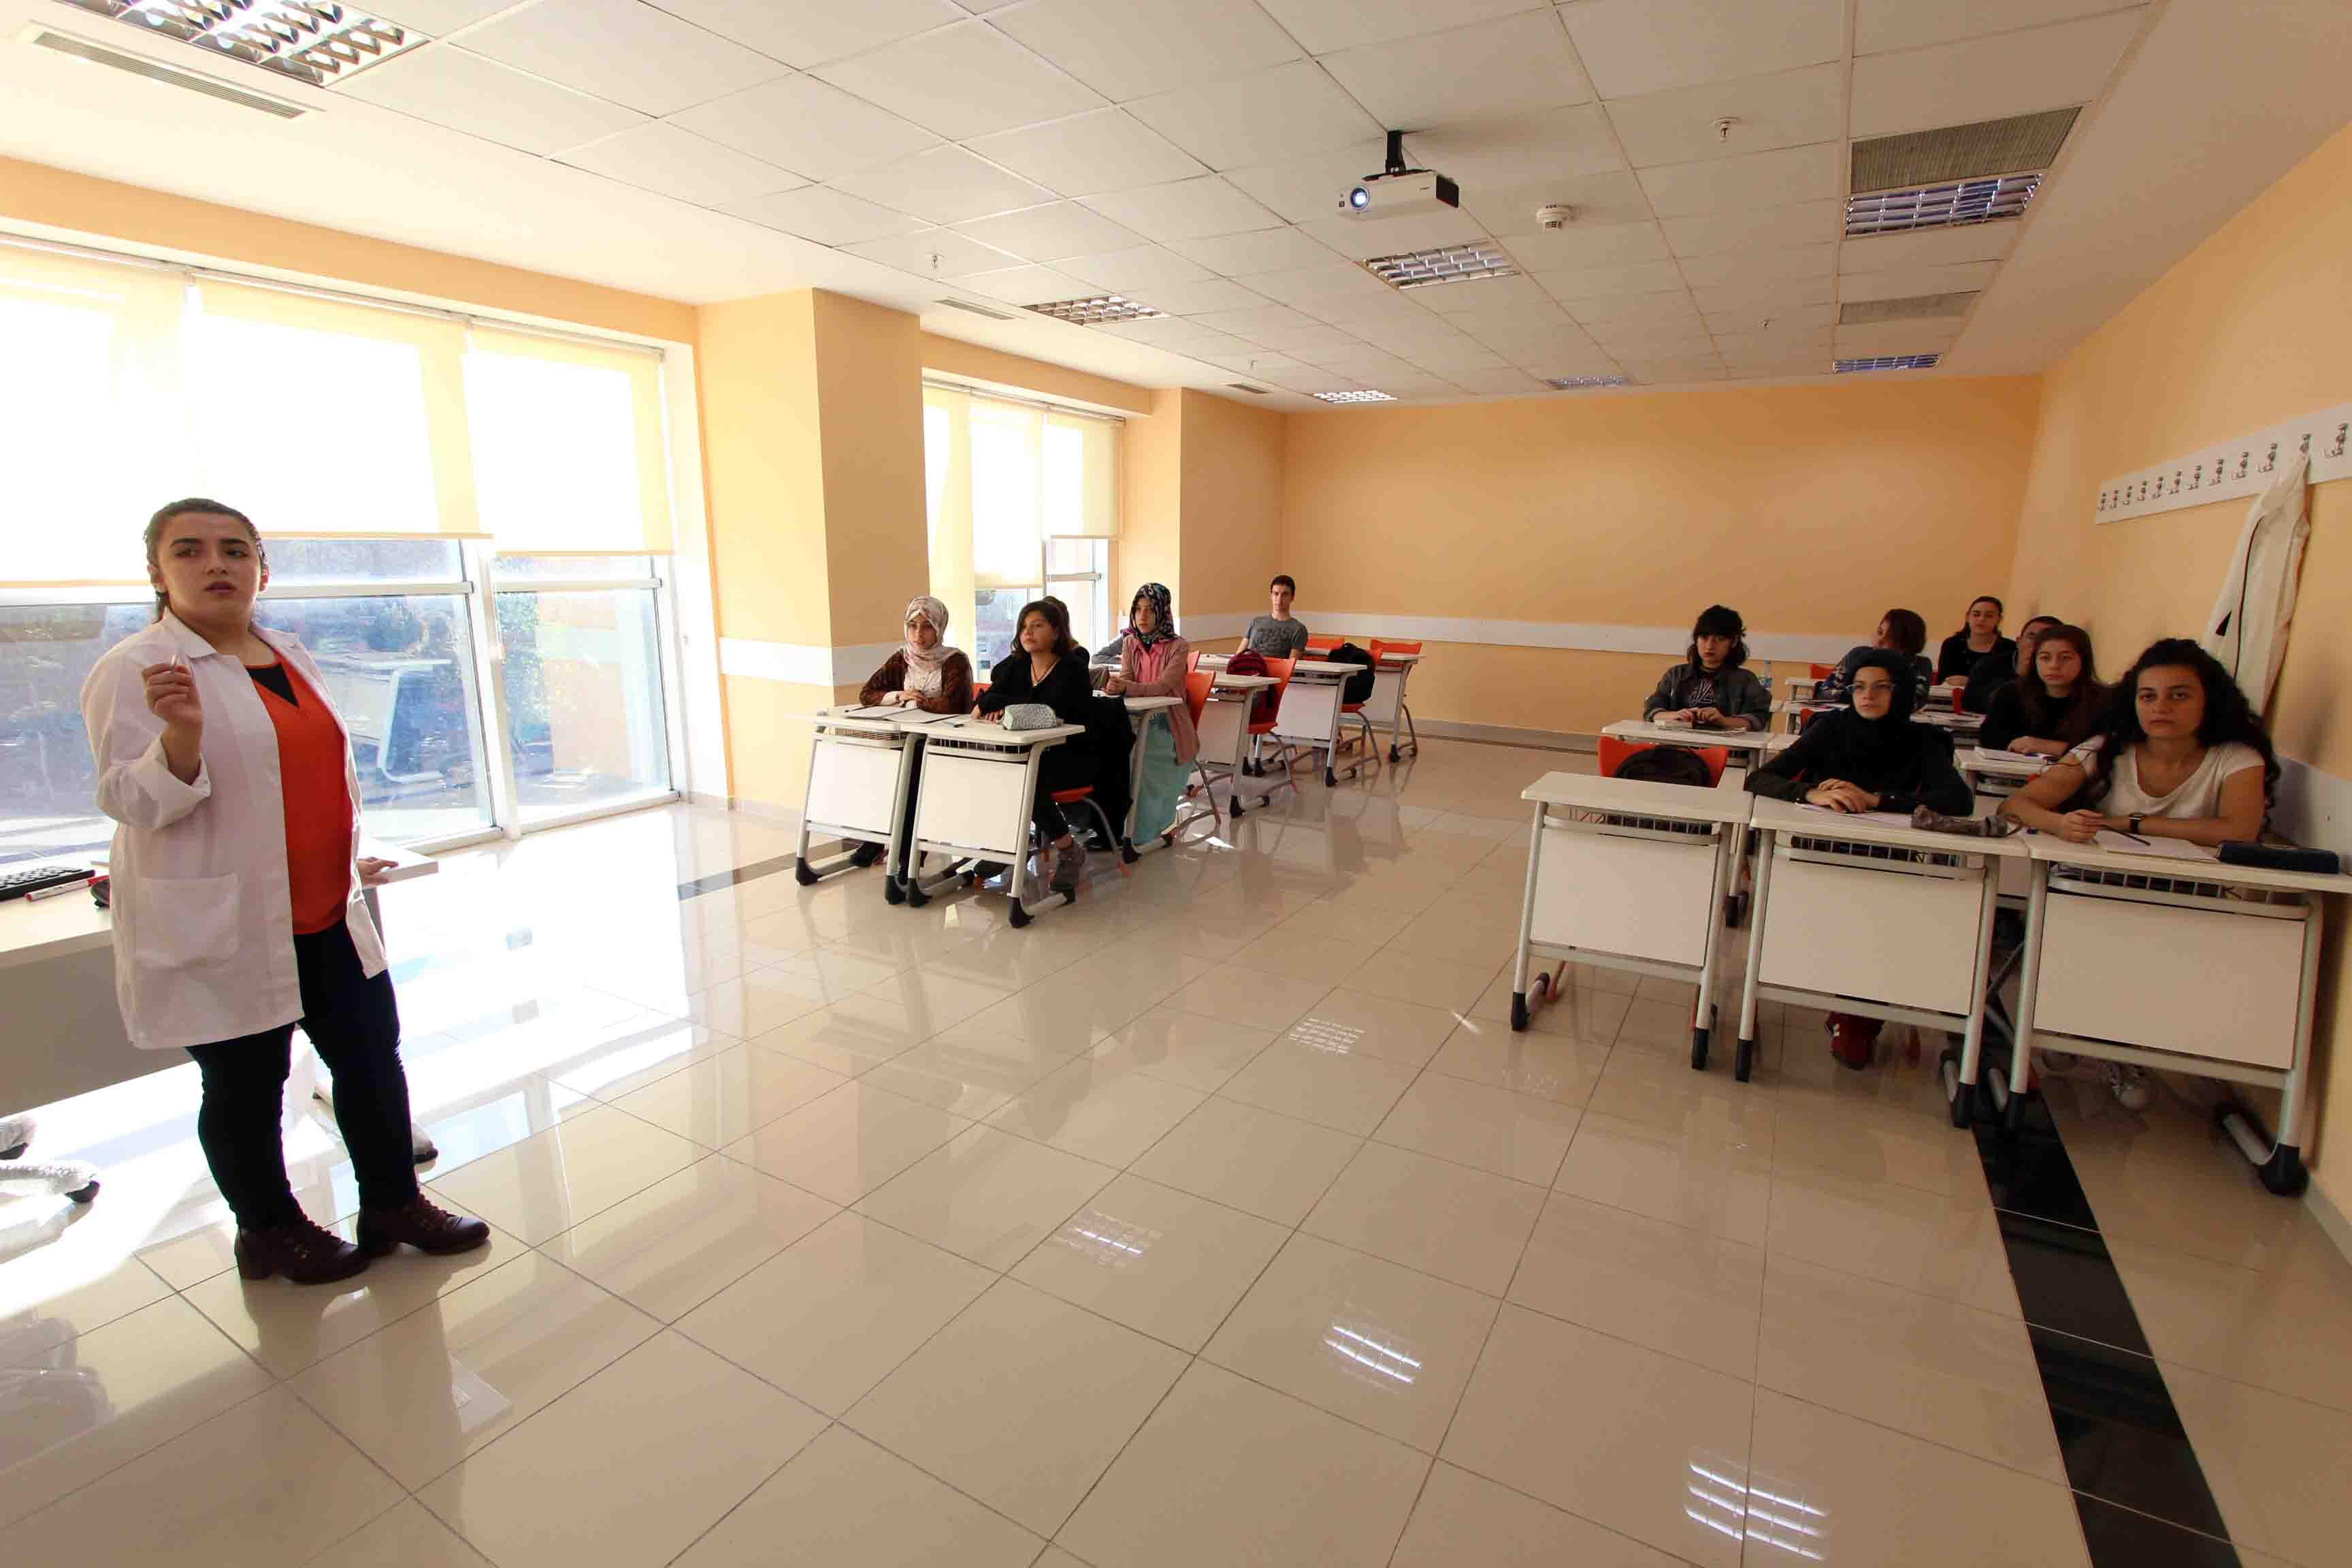 Gençlik Merkezi'nde 6 Bin 59 Genç 24 Branşta Eğitim Alıyor